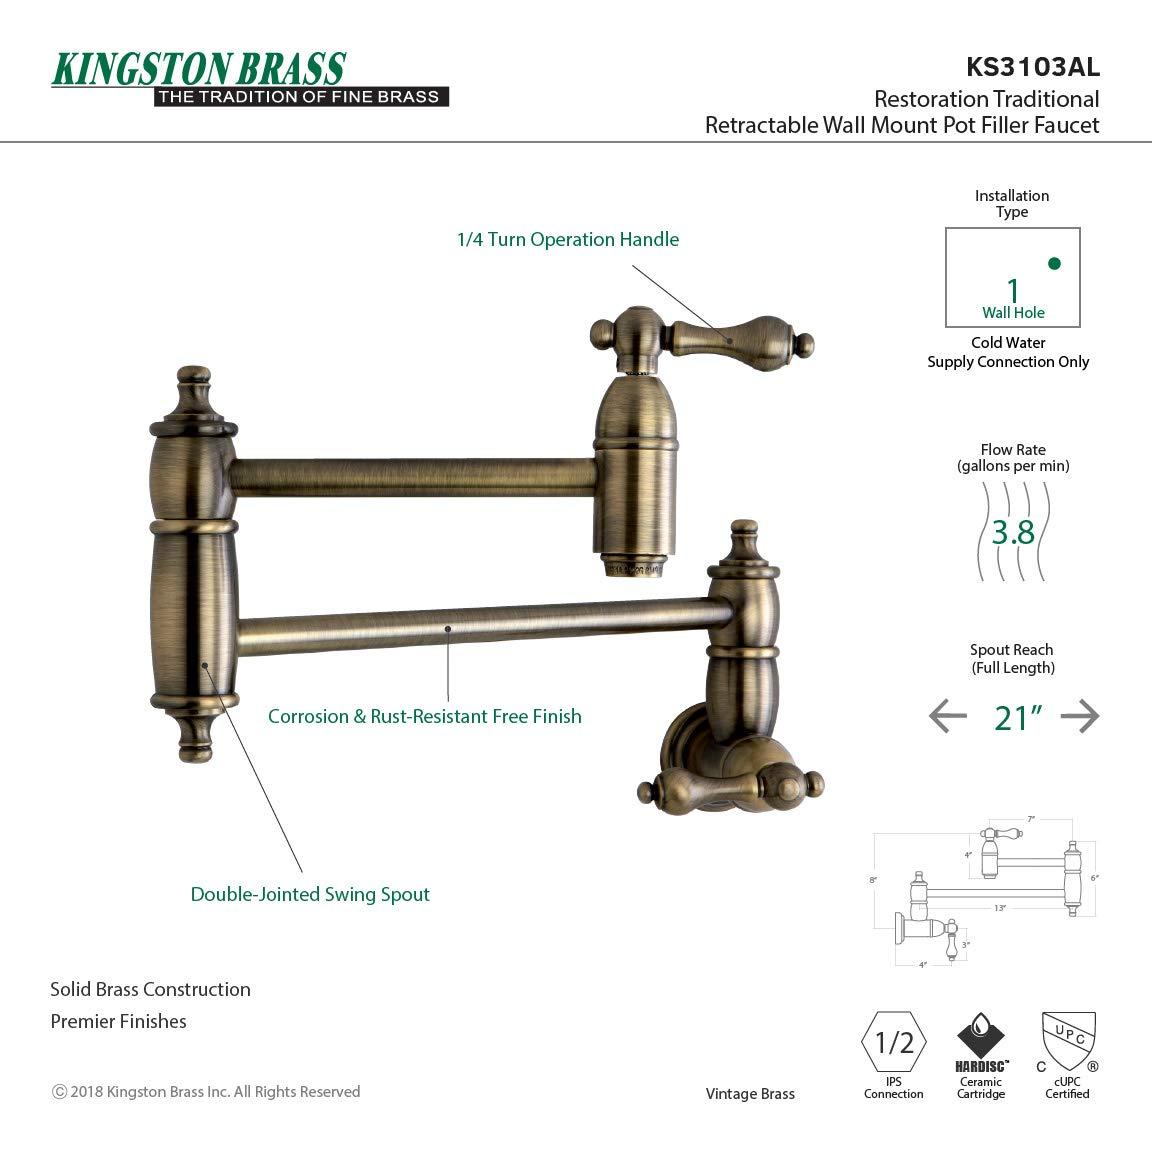 Kingston Brass KS3103AL Restoration Pot Filler, Vintage Brass